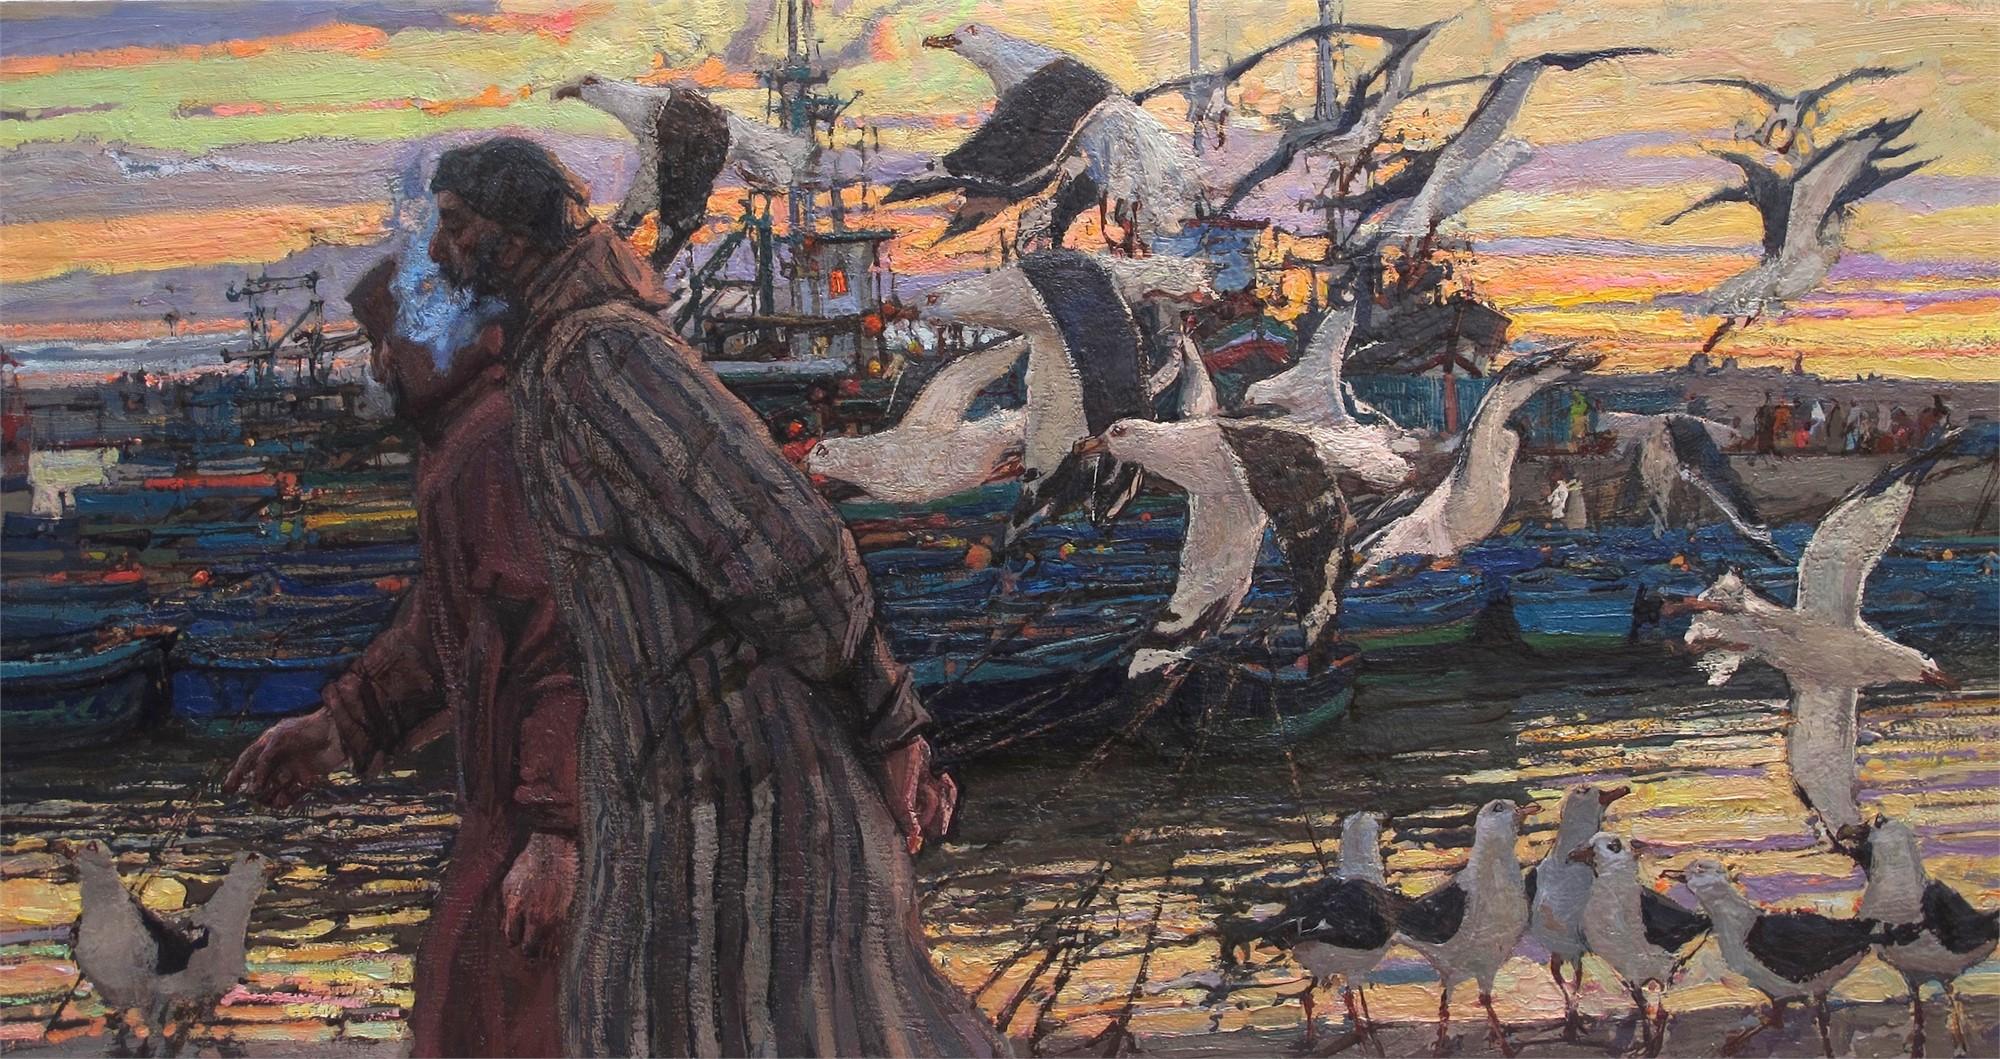 Harbor Conversation by Daud Akhriev